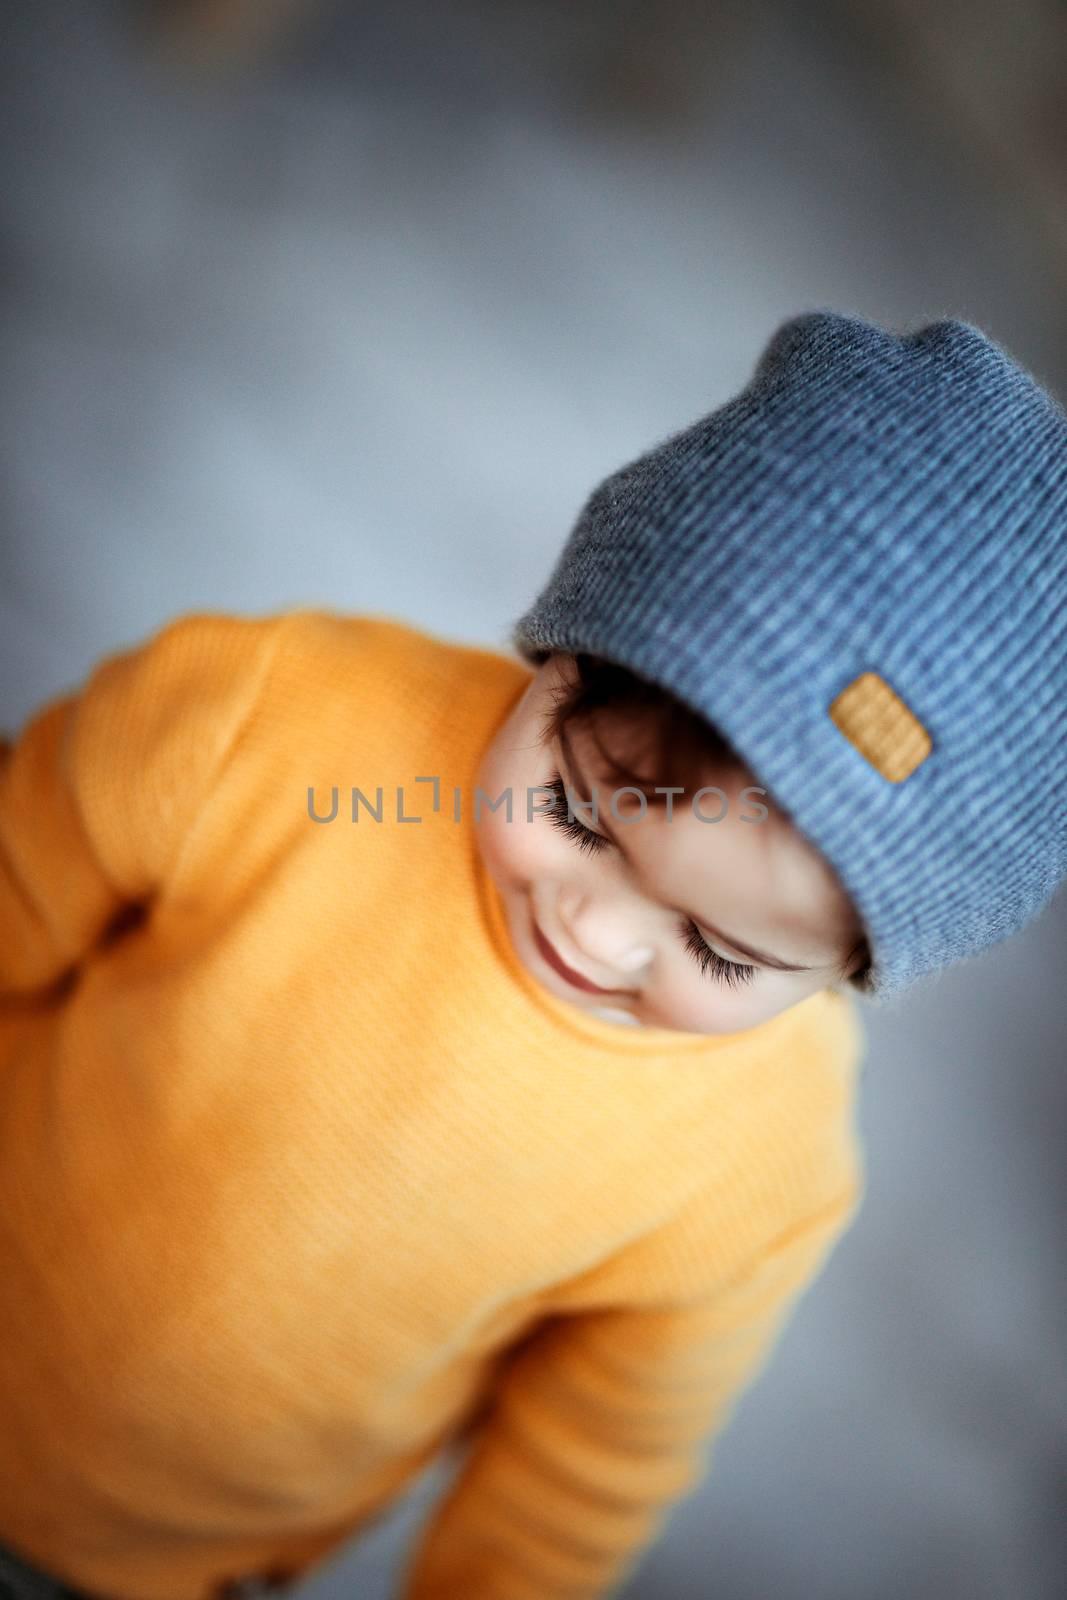 Cute baby boy wearing stylish warm clothes, kids fashion, autumn season, cute trendy little child